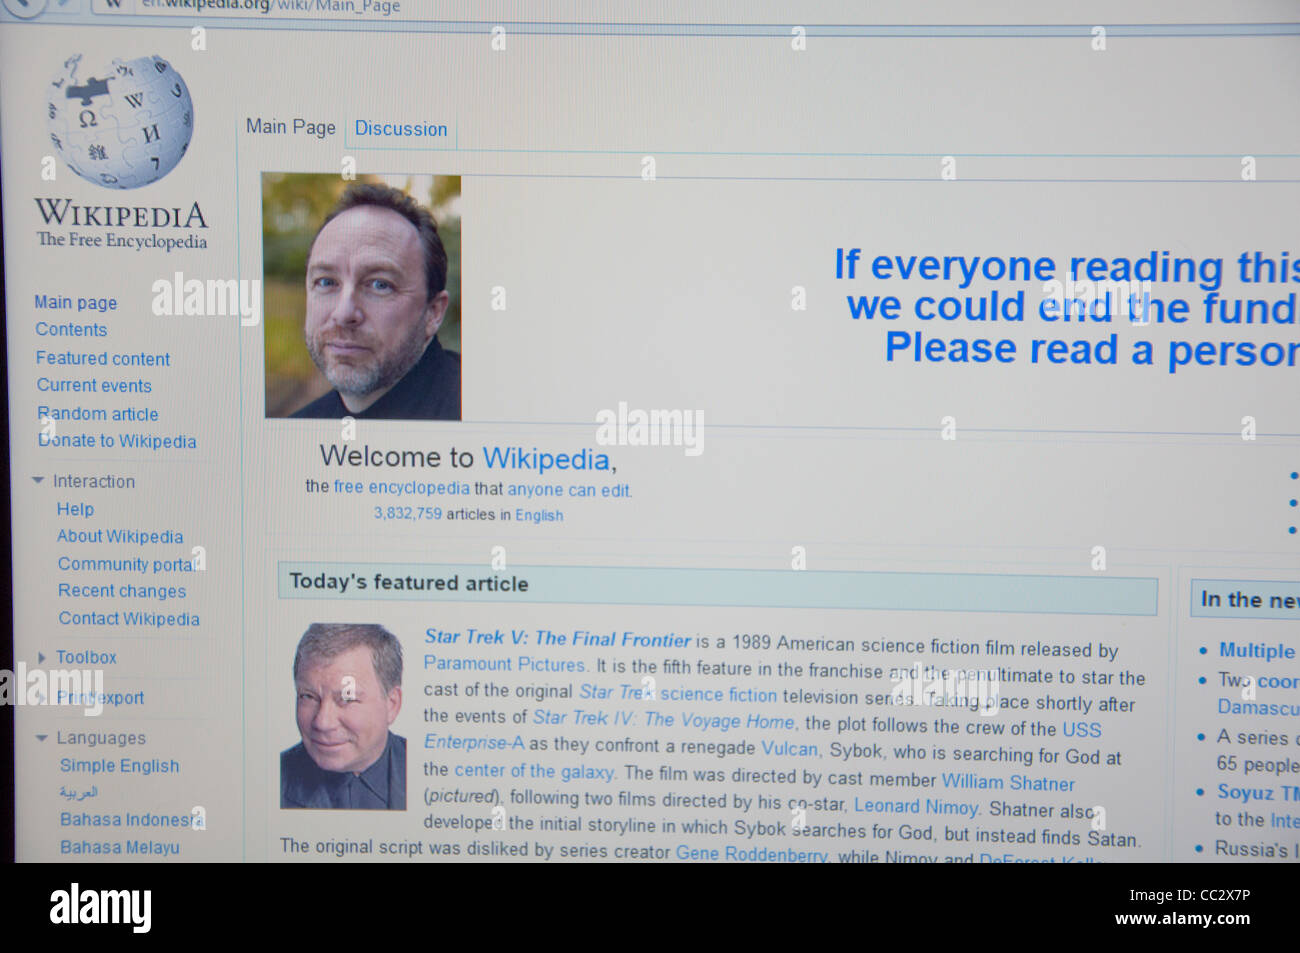 Wikipedia website online screenshot screen shot - Stock Image